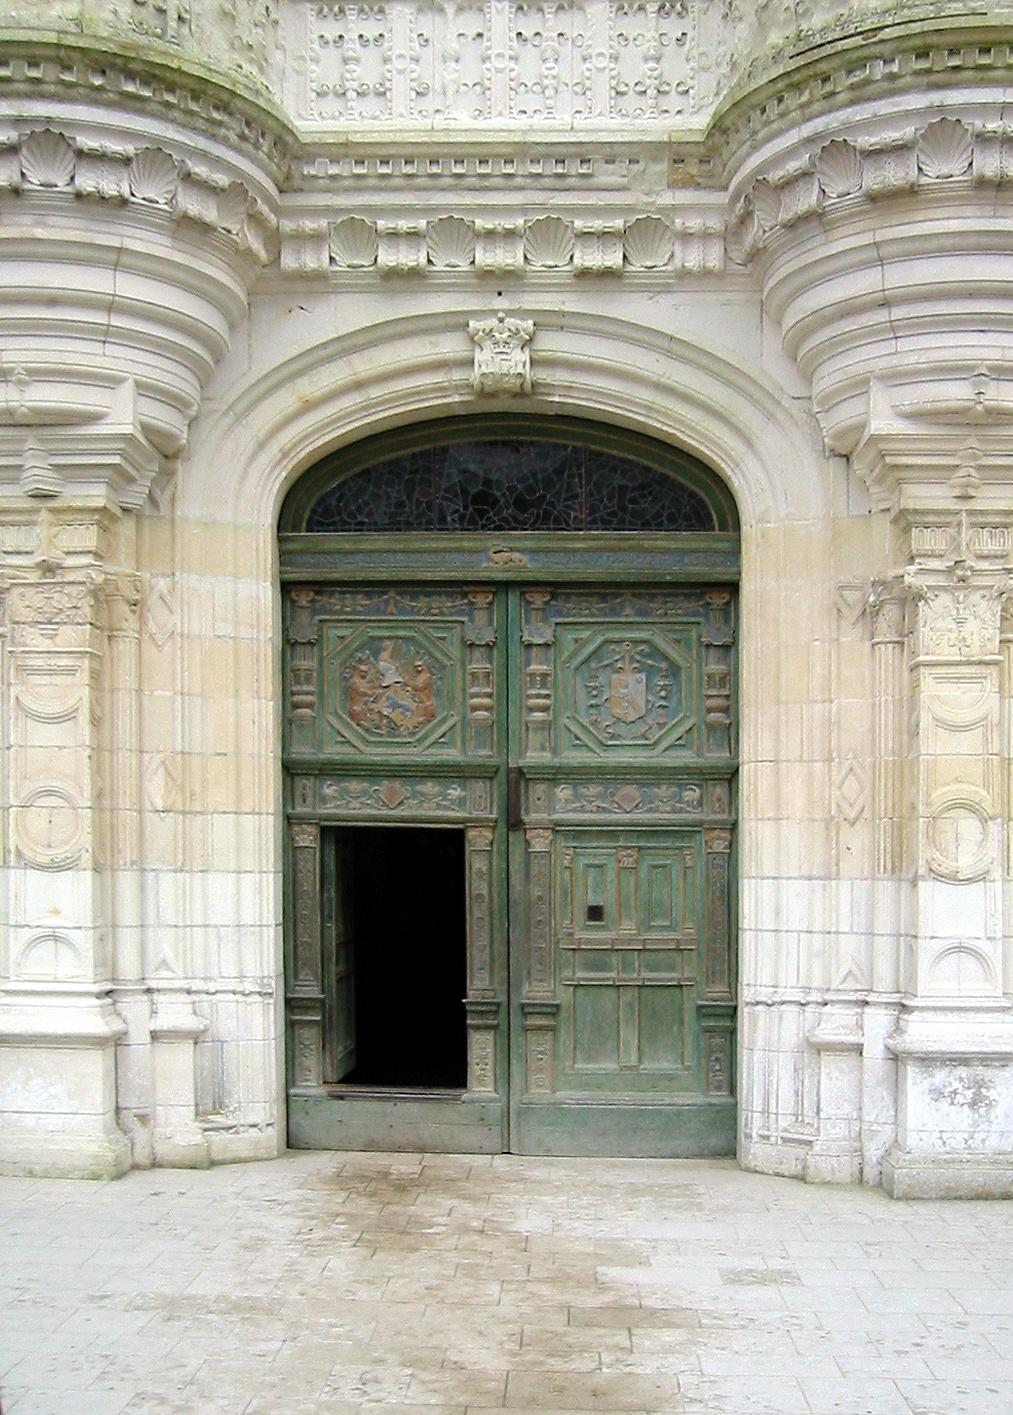 Porte guichet wiktionnaire for Etymologie architecture